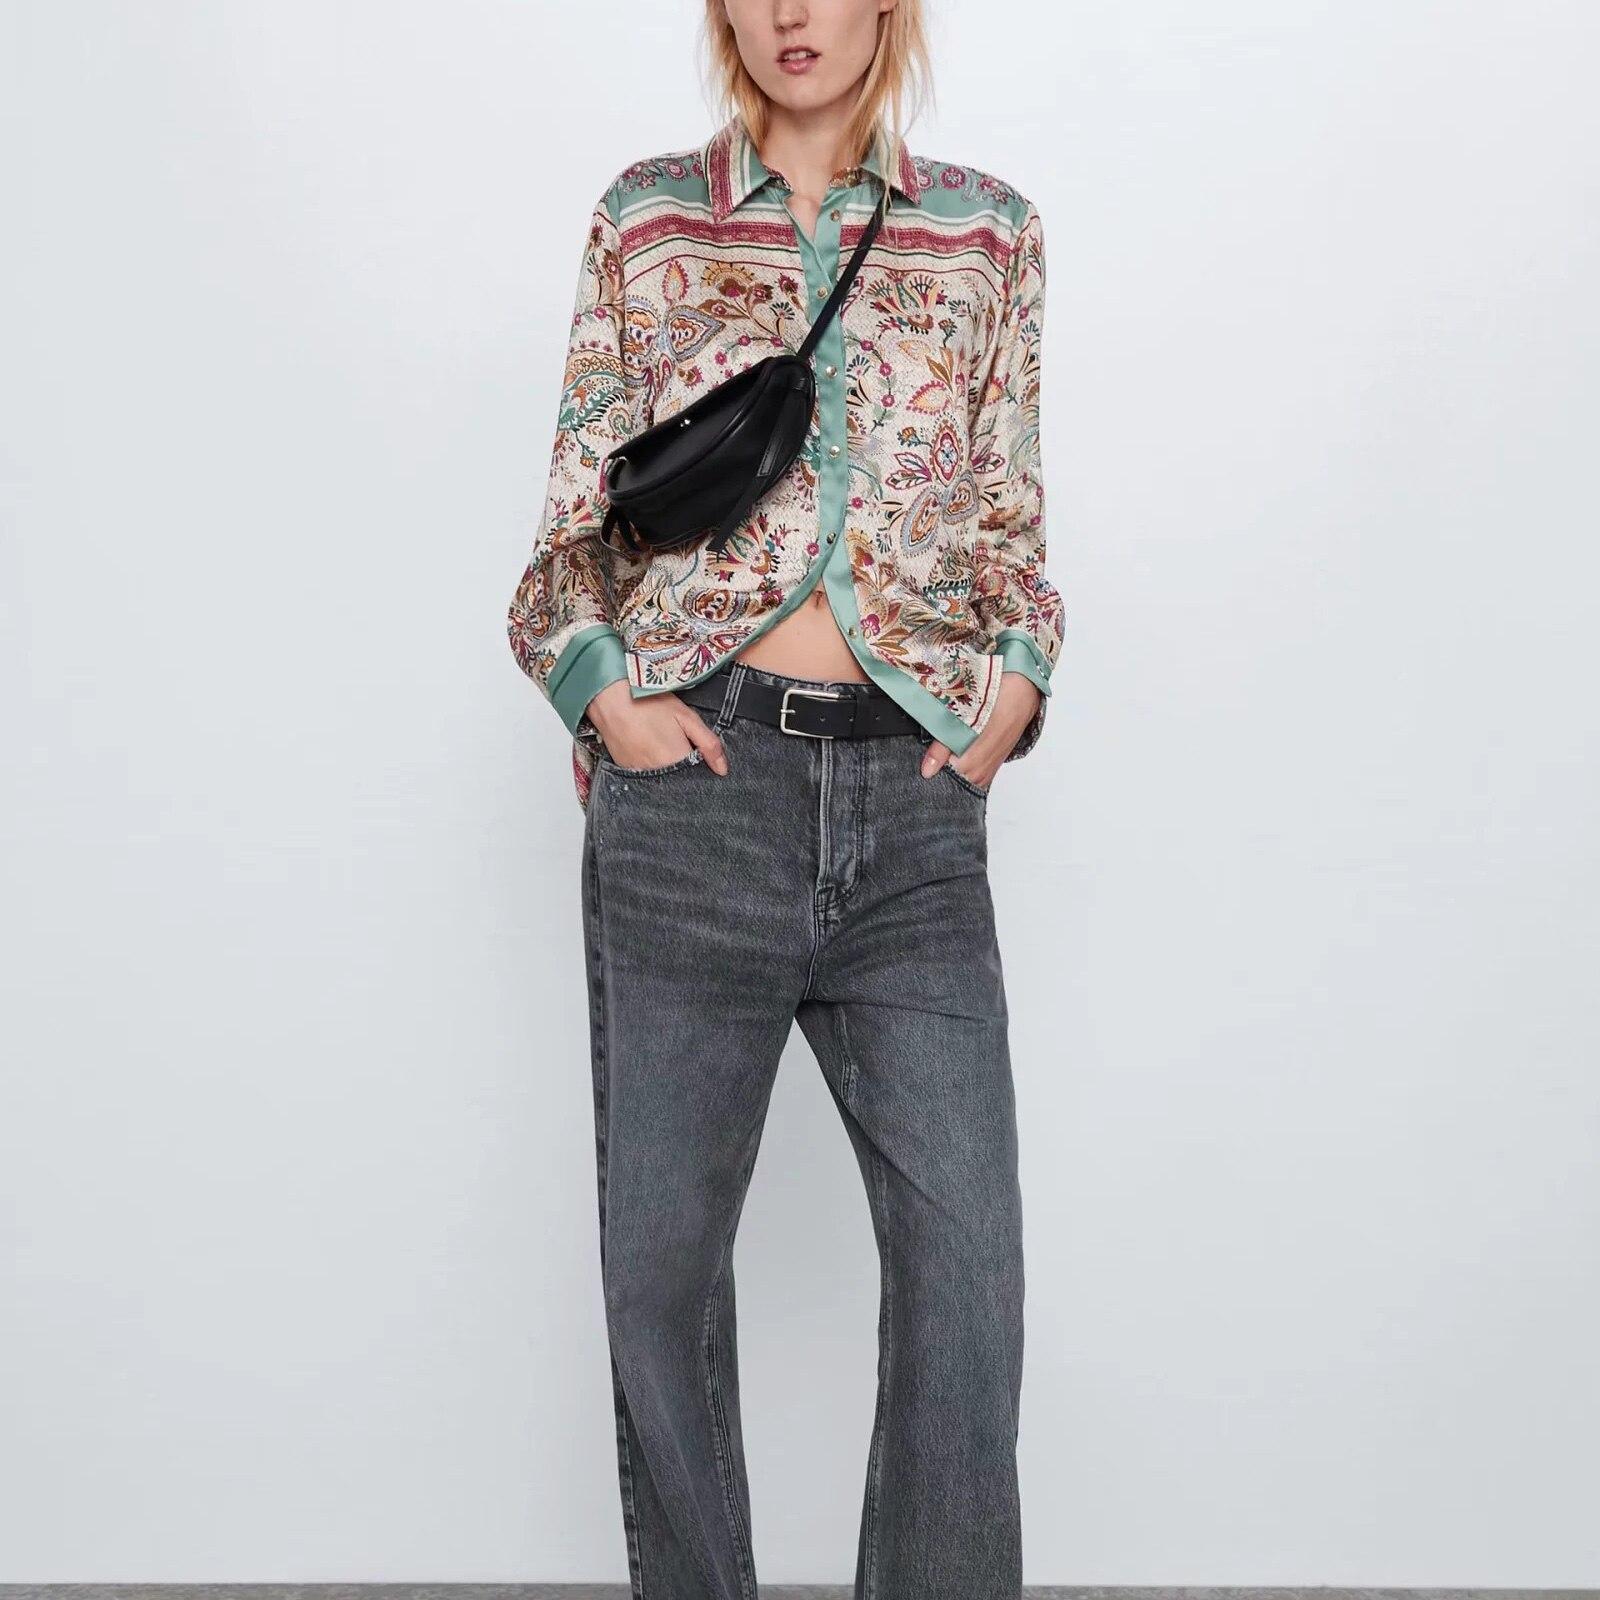 ZA blusa mujer camisa estampado Vintage tops Casual señoras blusa mujer ropa mujer